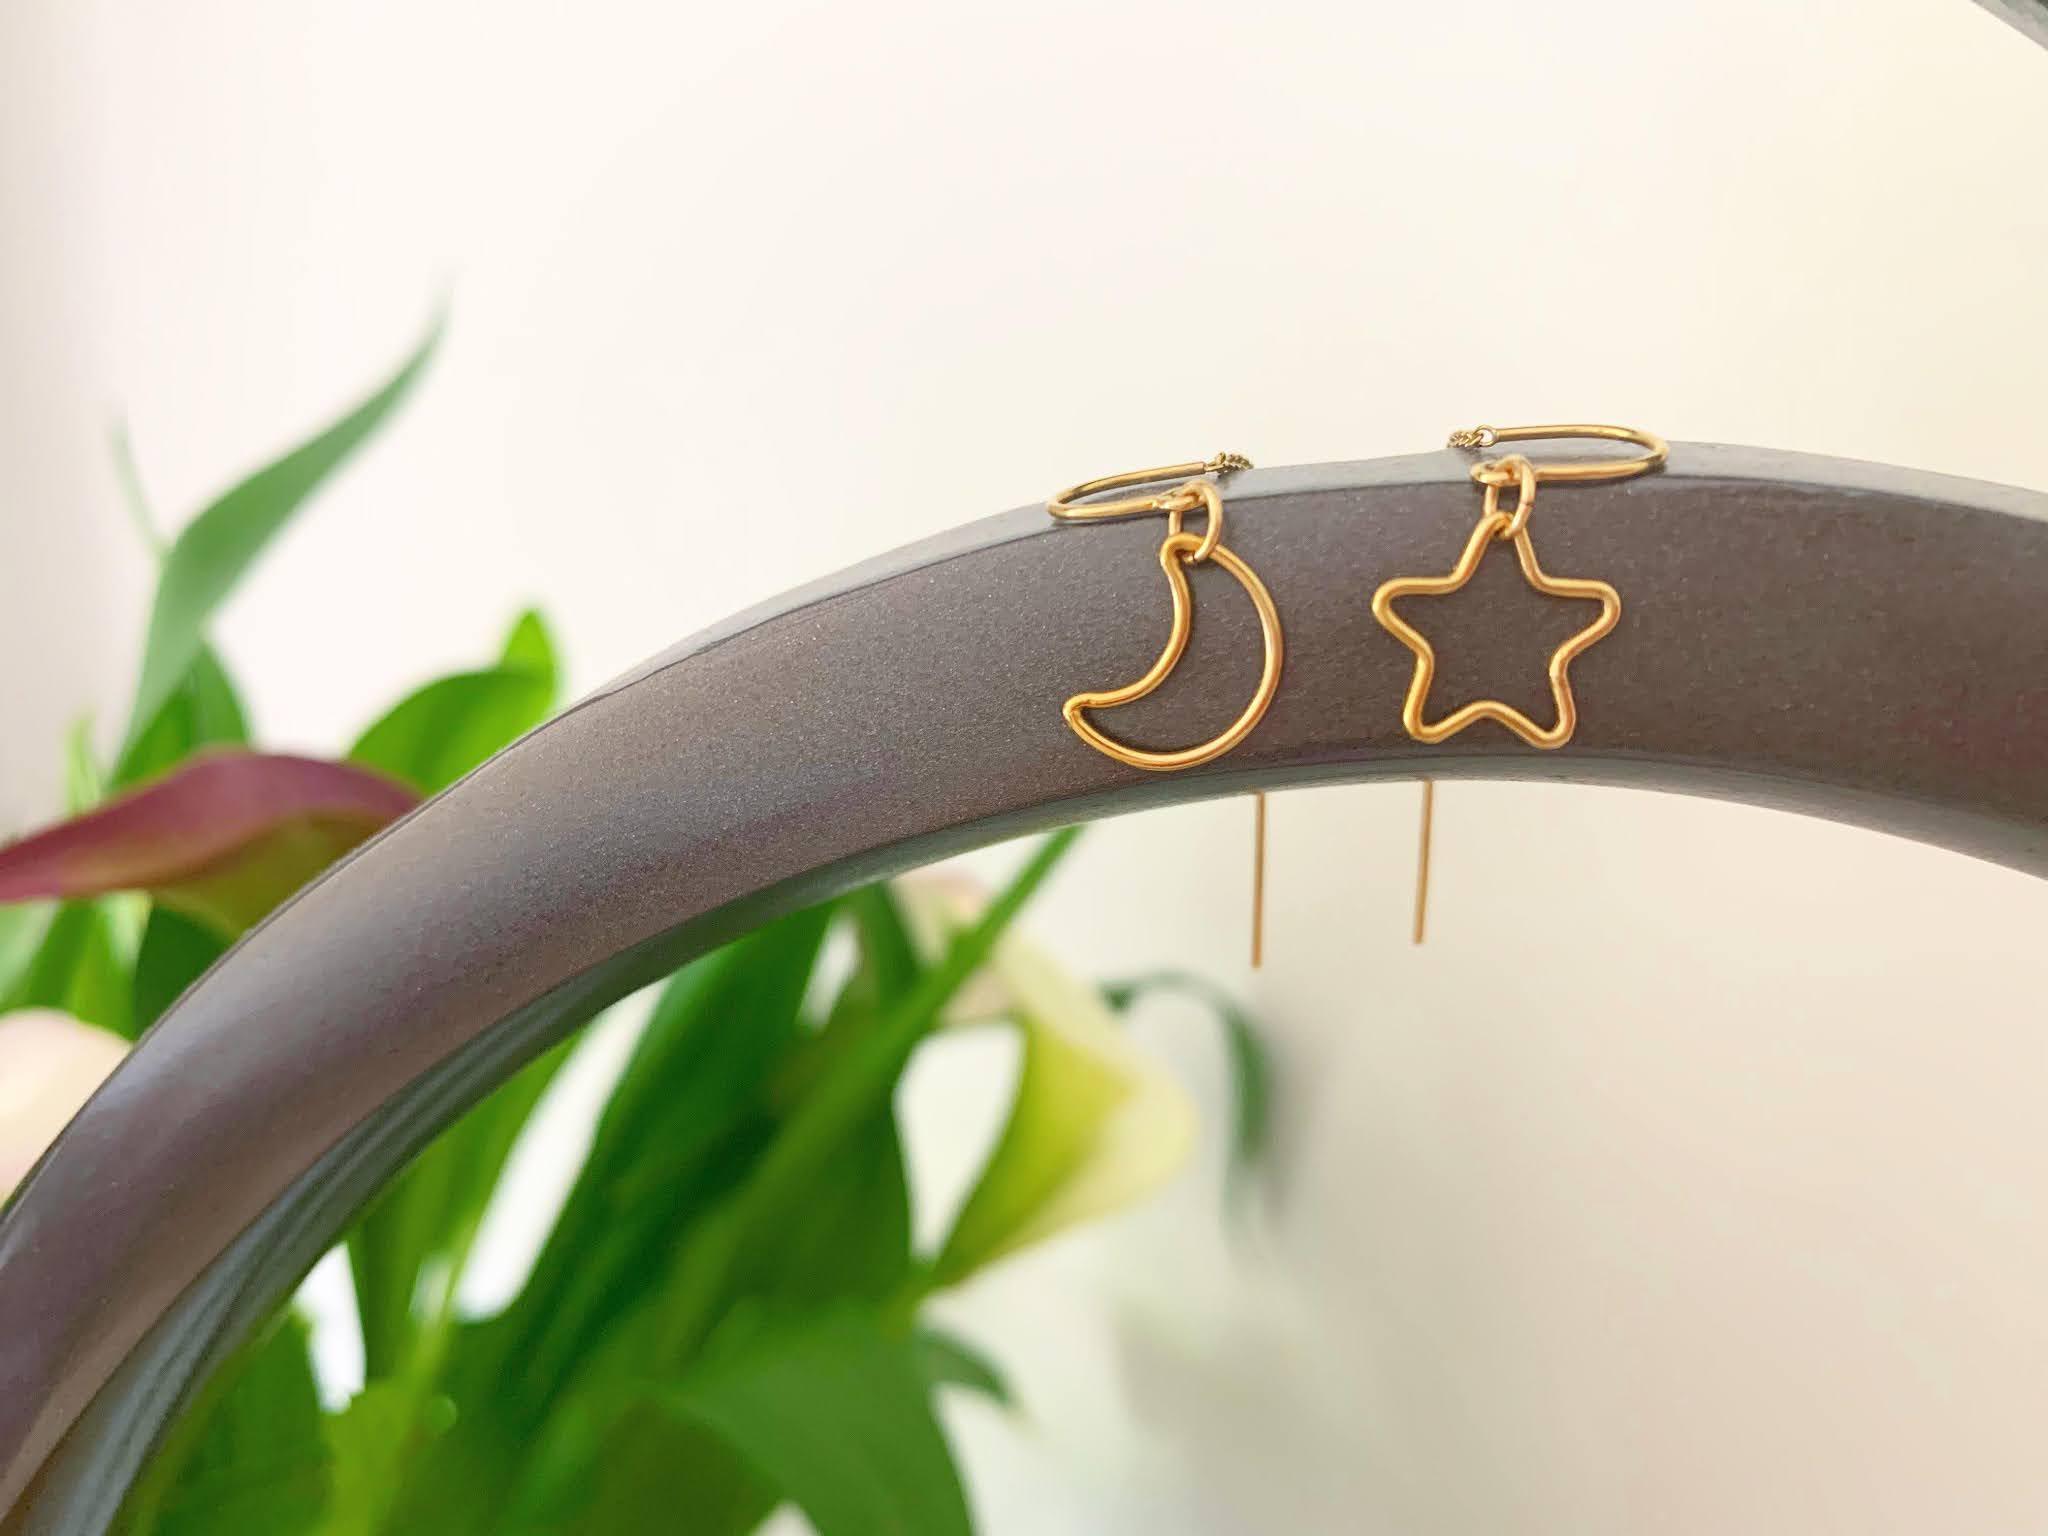 Binichohan Moon and Star Threader Earrings on a rail